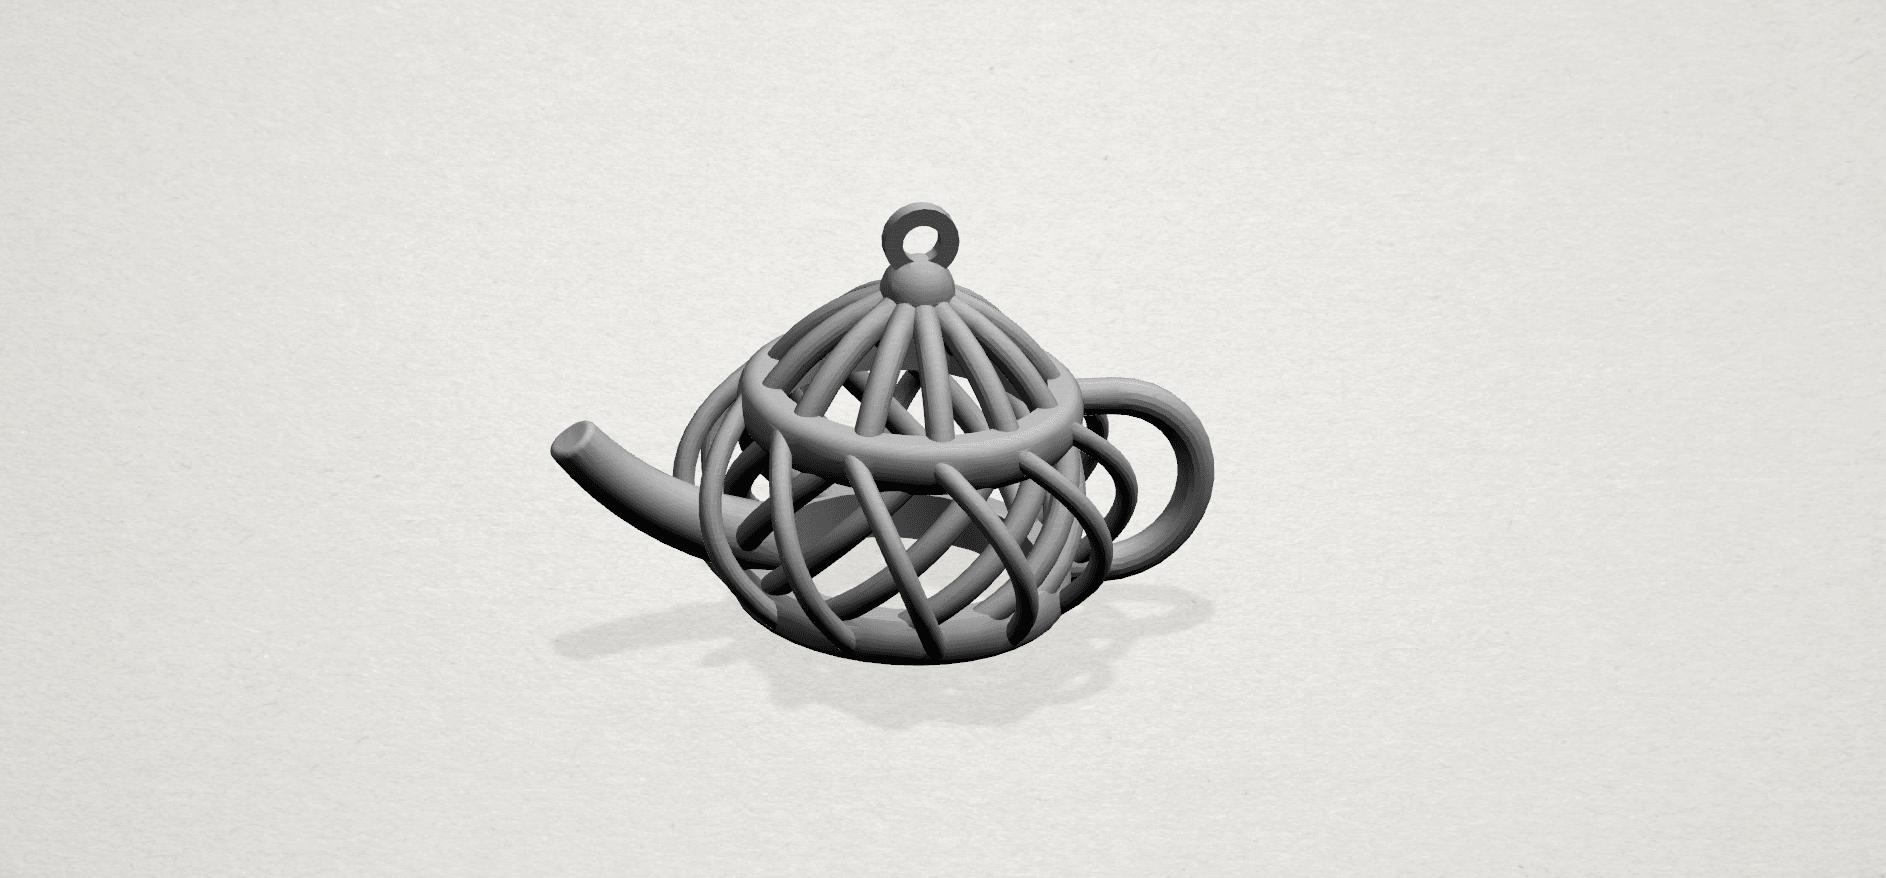 Necklace - Tea pot-A02.png Download free STL file Necklaces -Tea pot • 3D print object, GeorgesNikkei